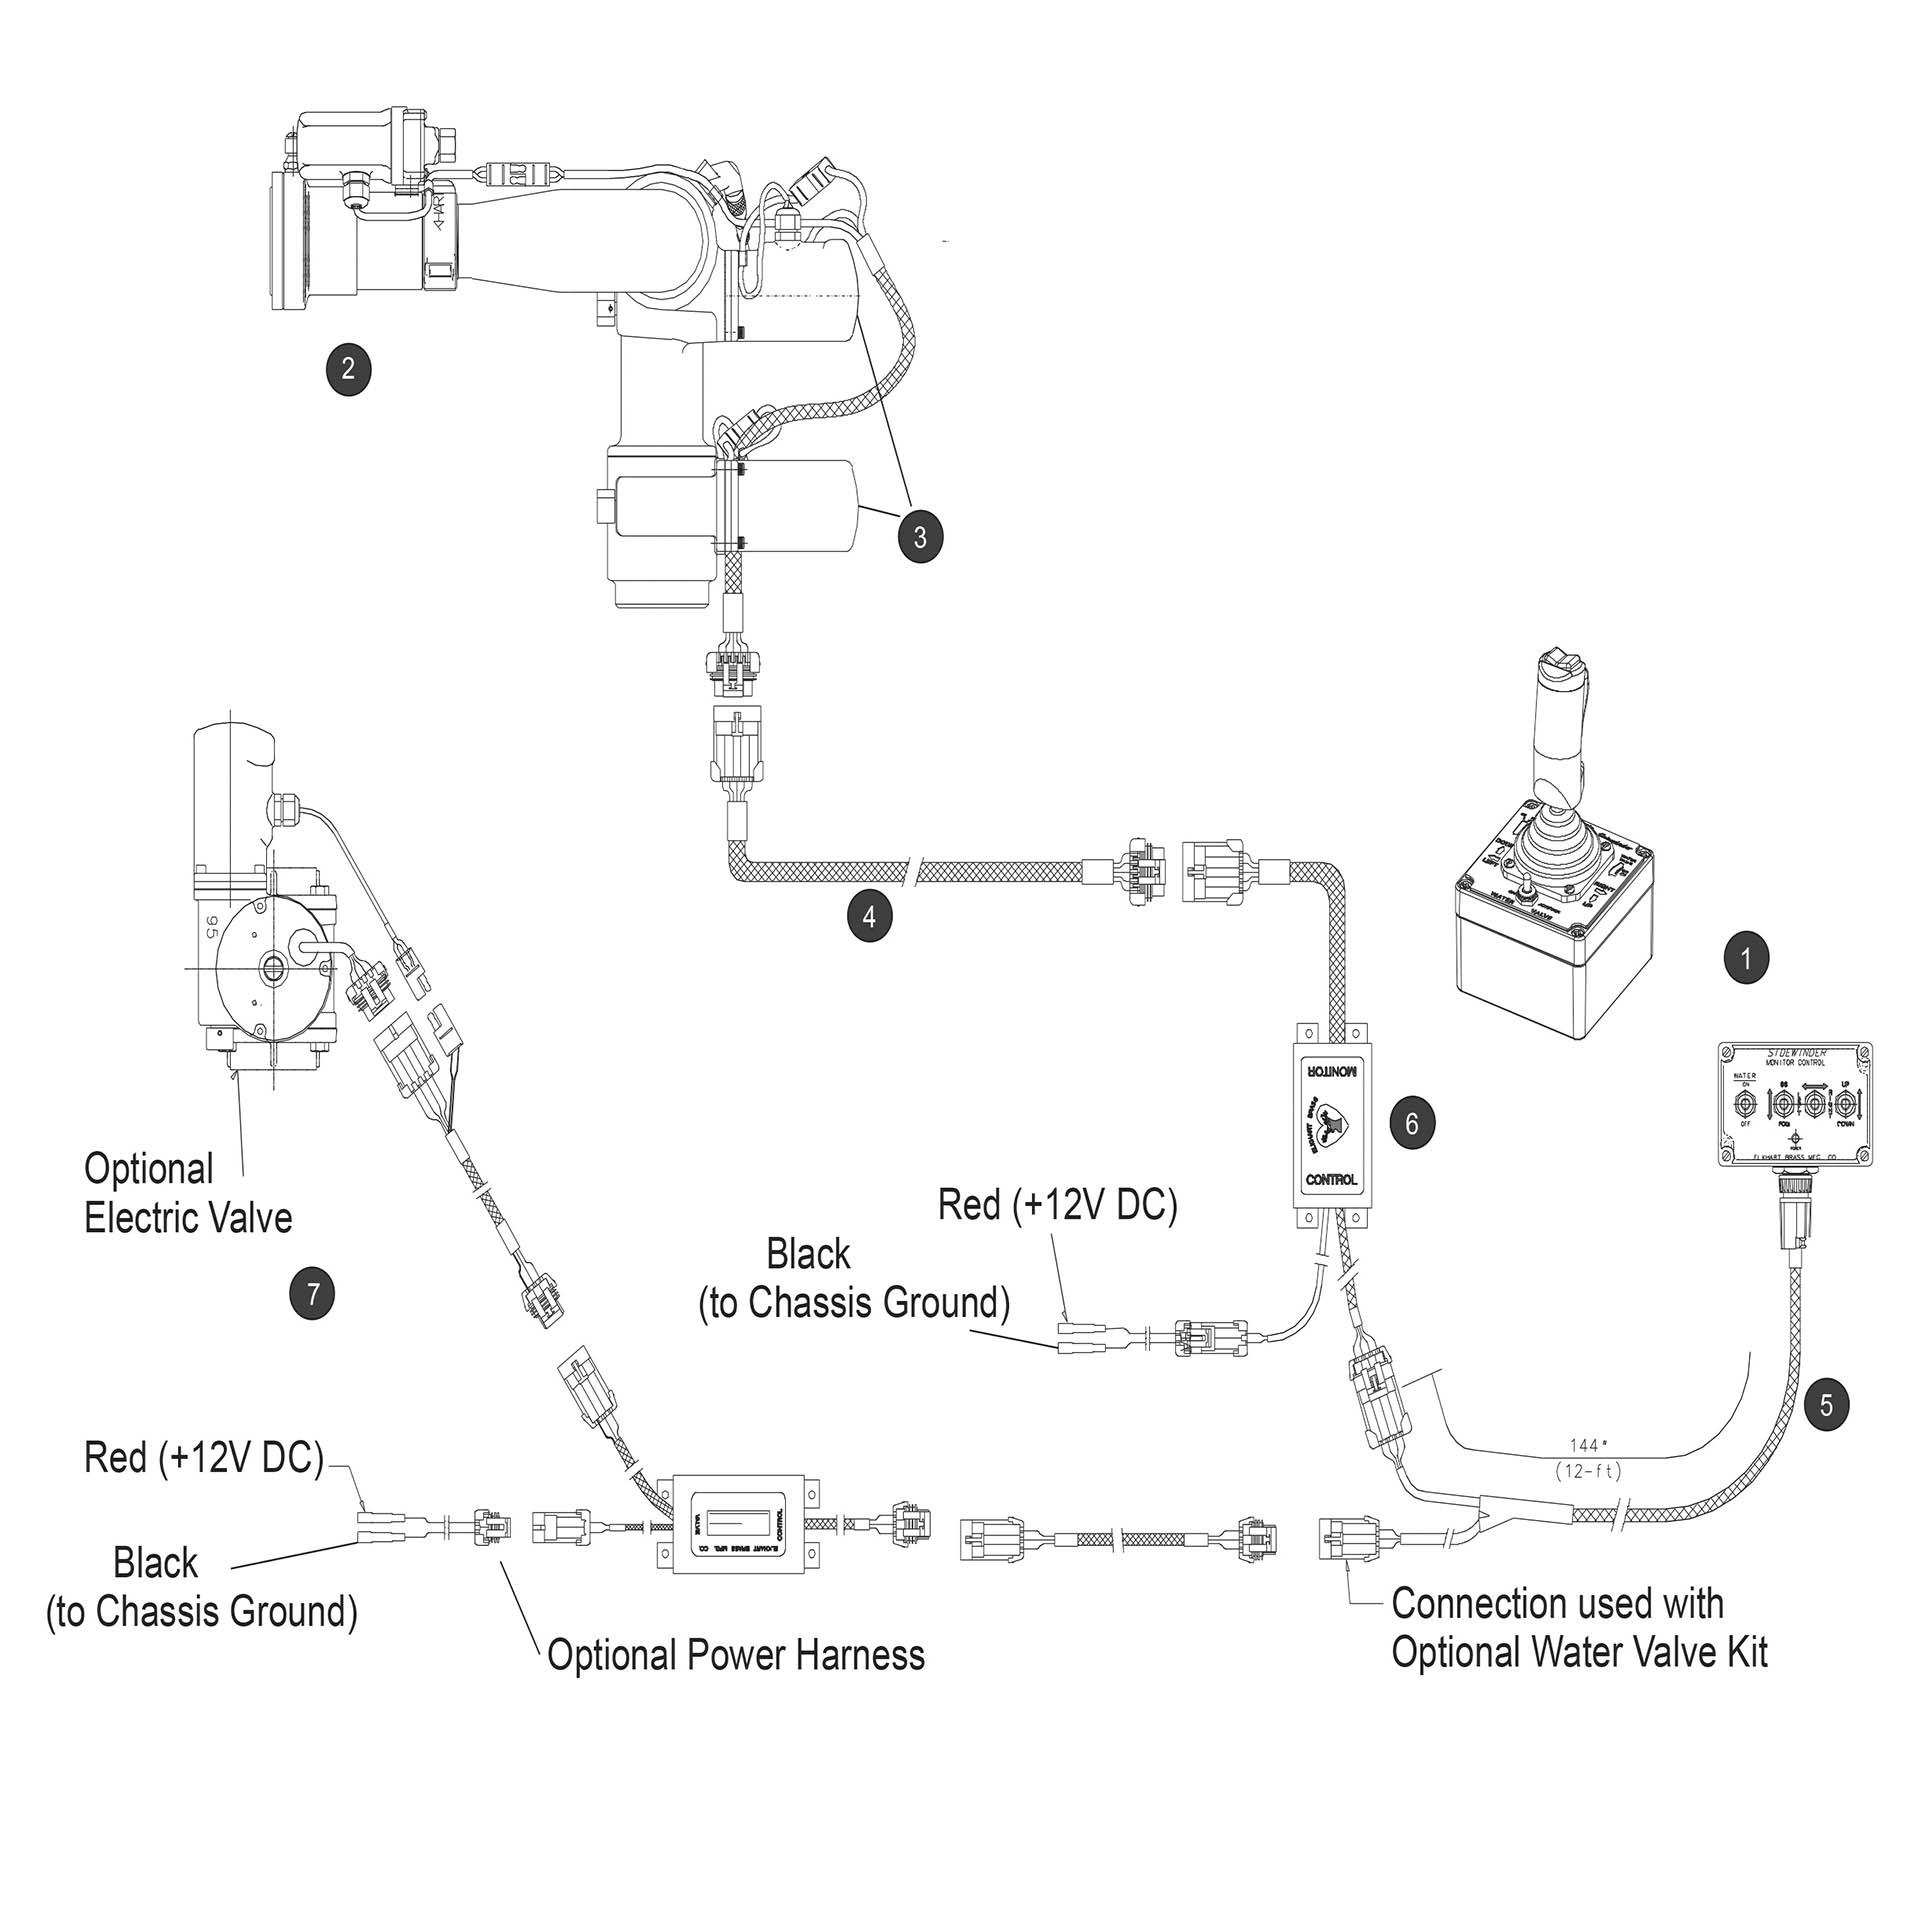 Elkhart Sidewinder Joystick Wiring Diagram | Wiring Liry on